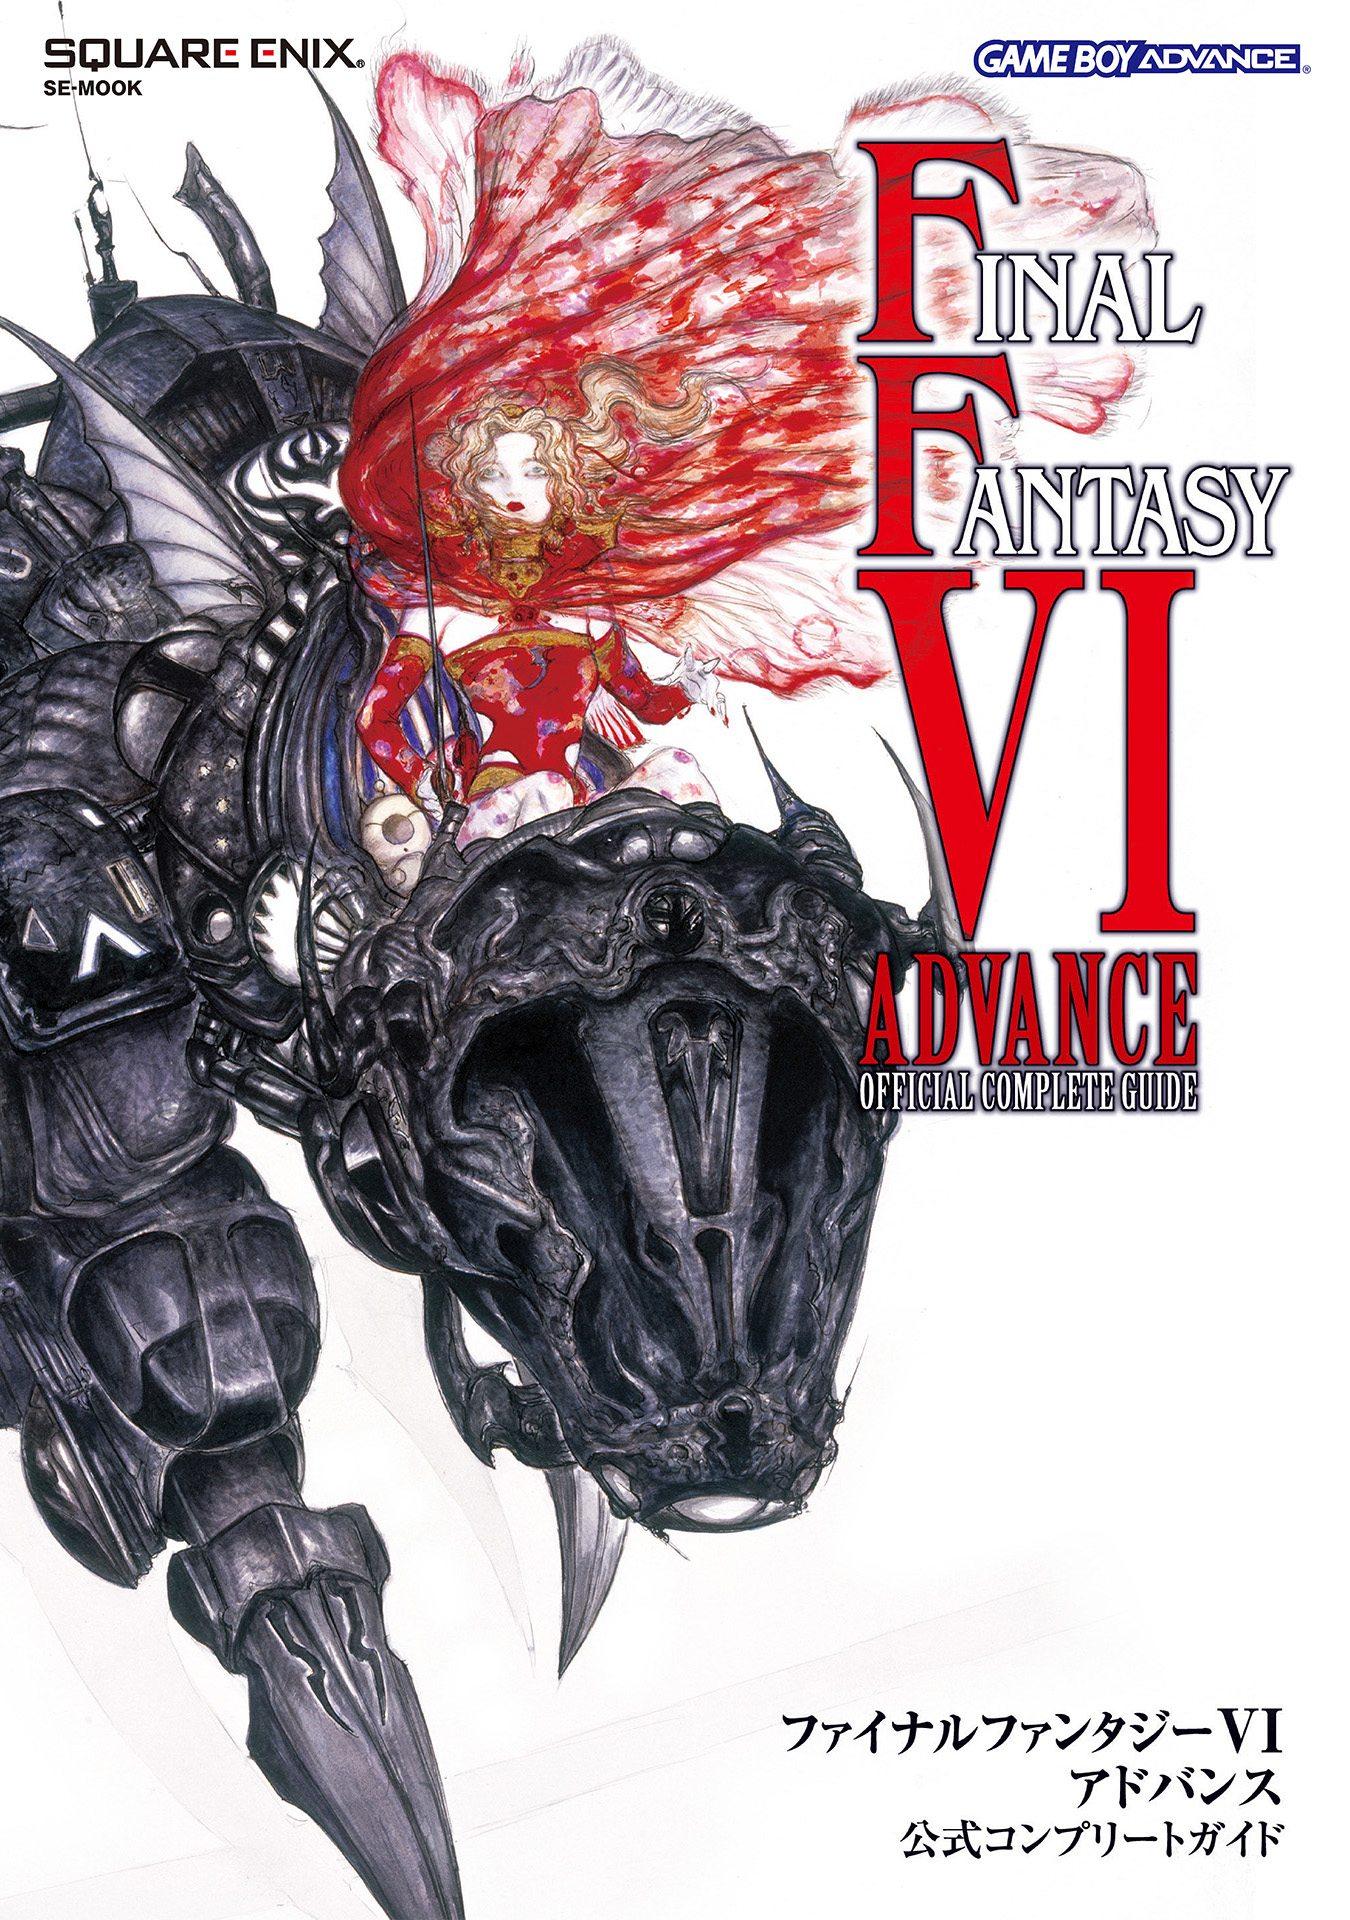 Final Fantasy VI Advance Official Complete Guide